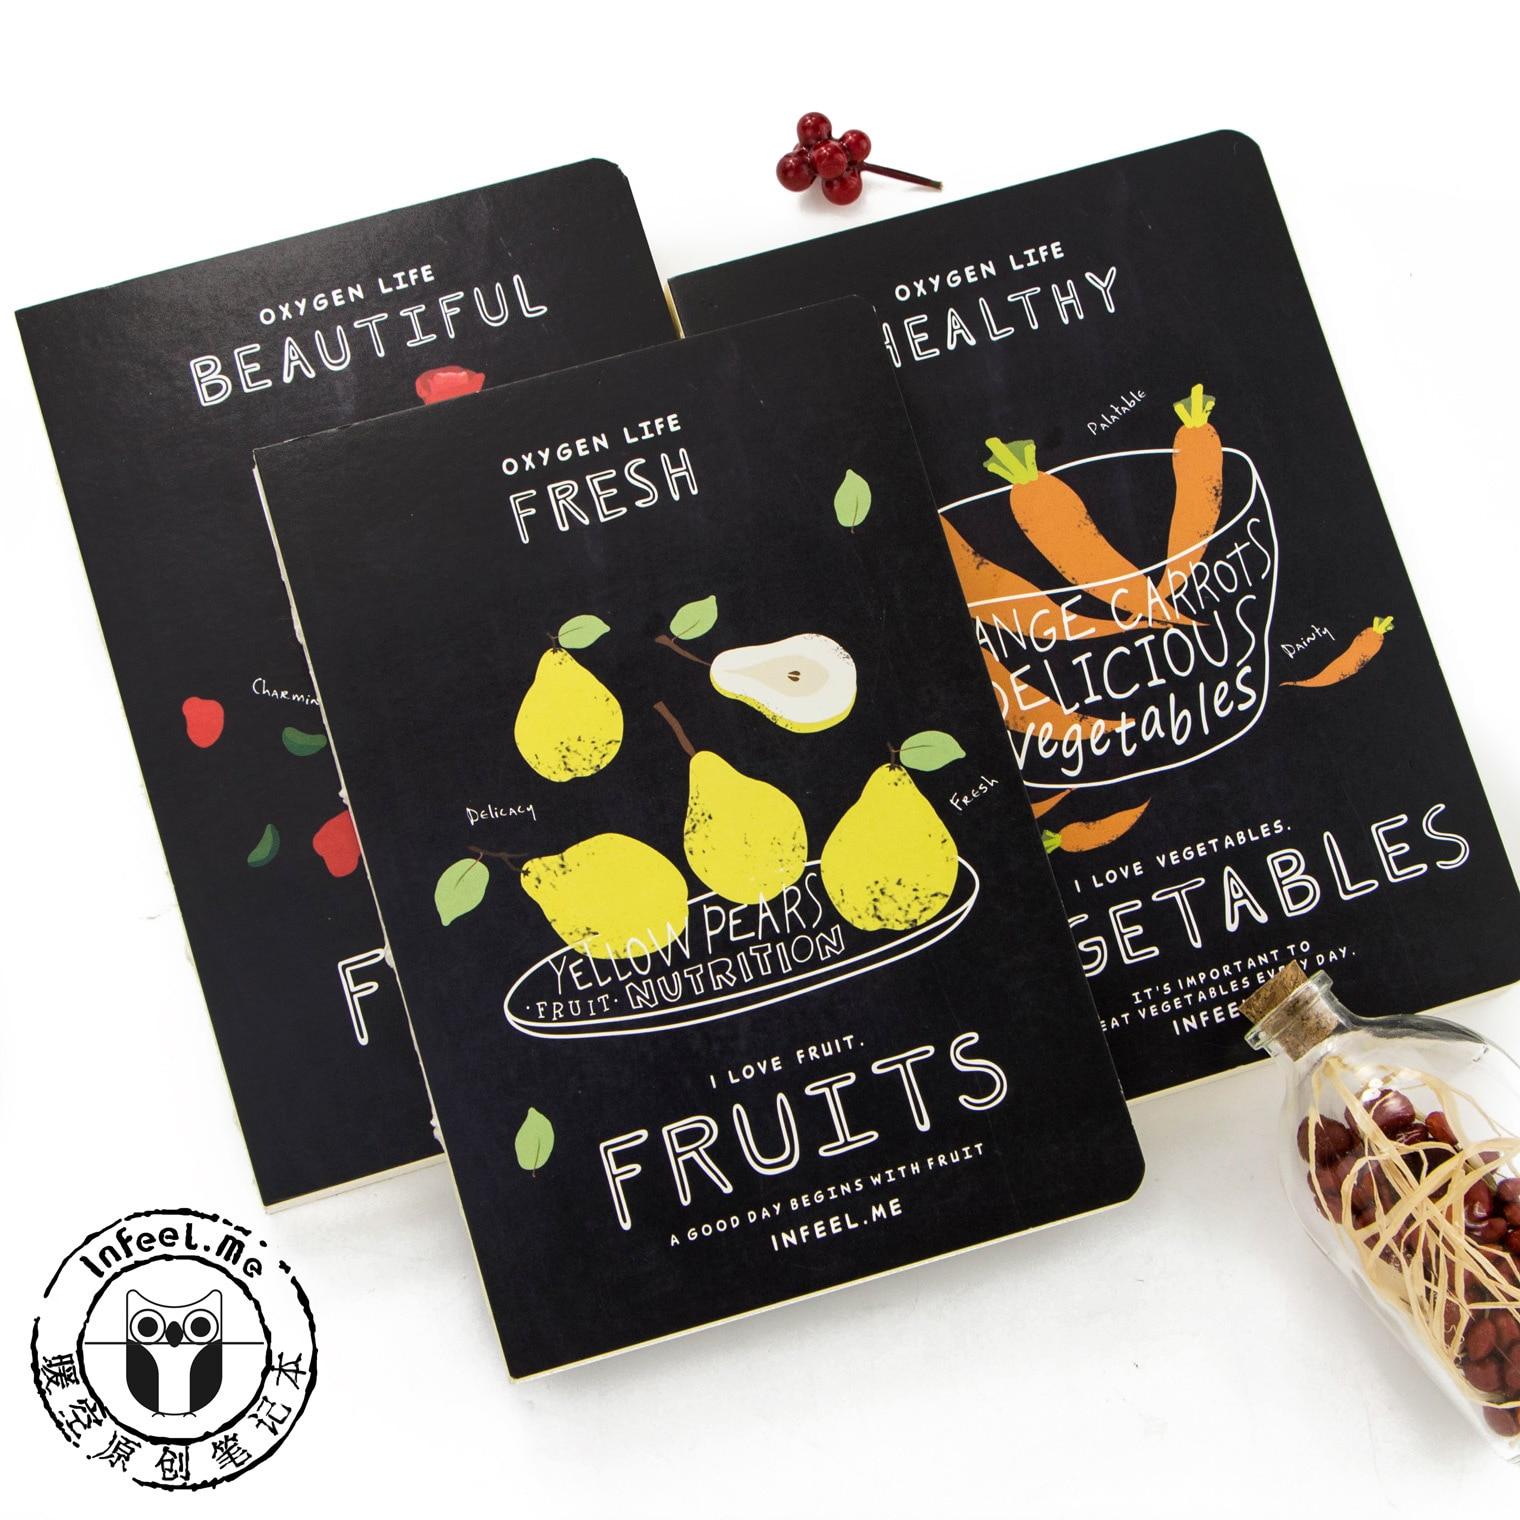 Oxygen Life Beautiful Flower Vigorous Succulent Healthy Vegetables Fresh Fruits Notebook Agenda Personal Diary Book Gift цены онлайн